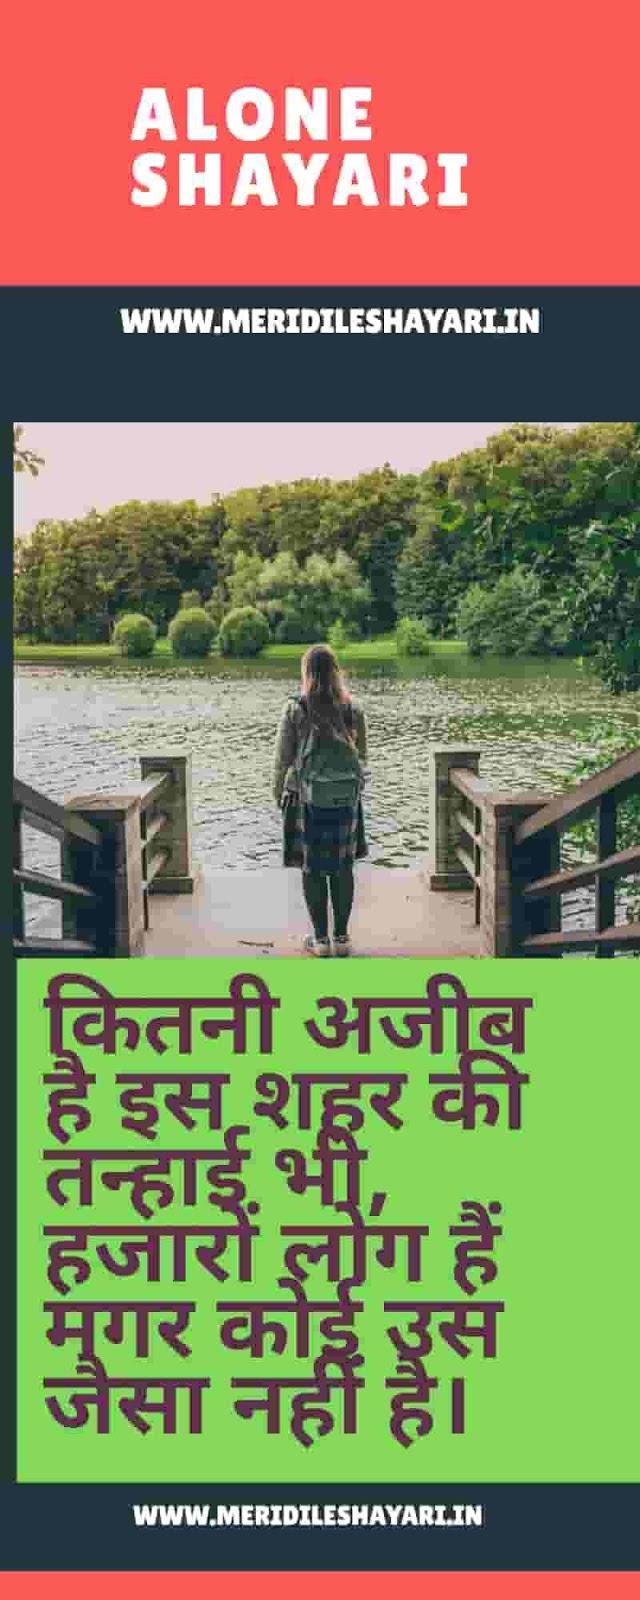 Alone shayari,alone shayari in hindi,alone hindi shayari,alone shayari image in hindi,alone 2 line shayari in hindi,alone hindi shayari image,meri dil e shayari